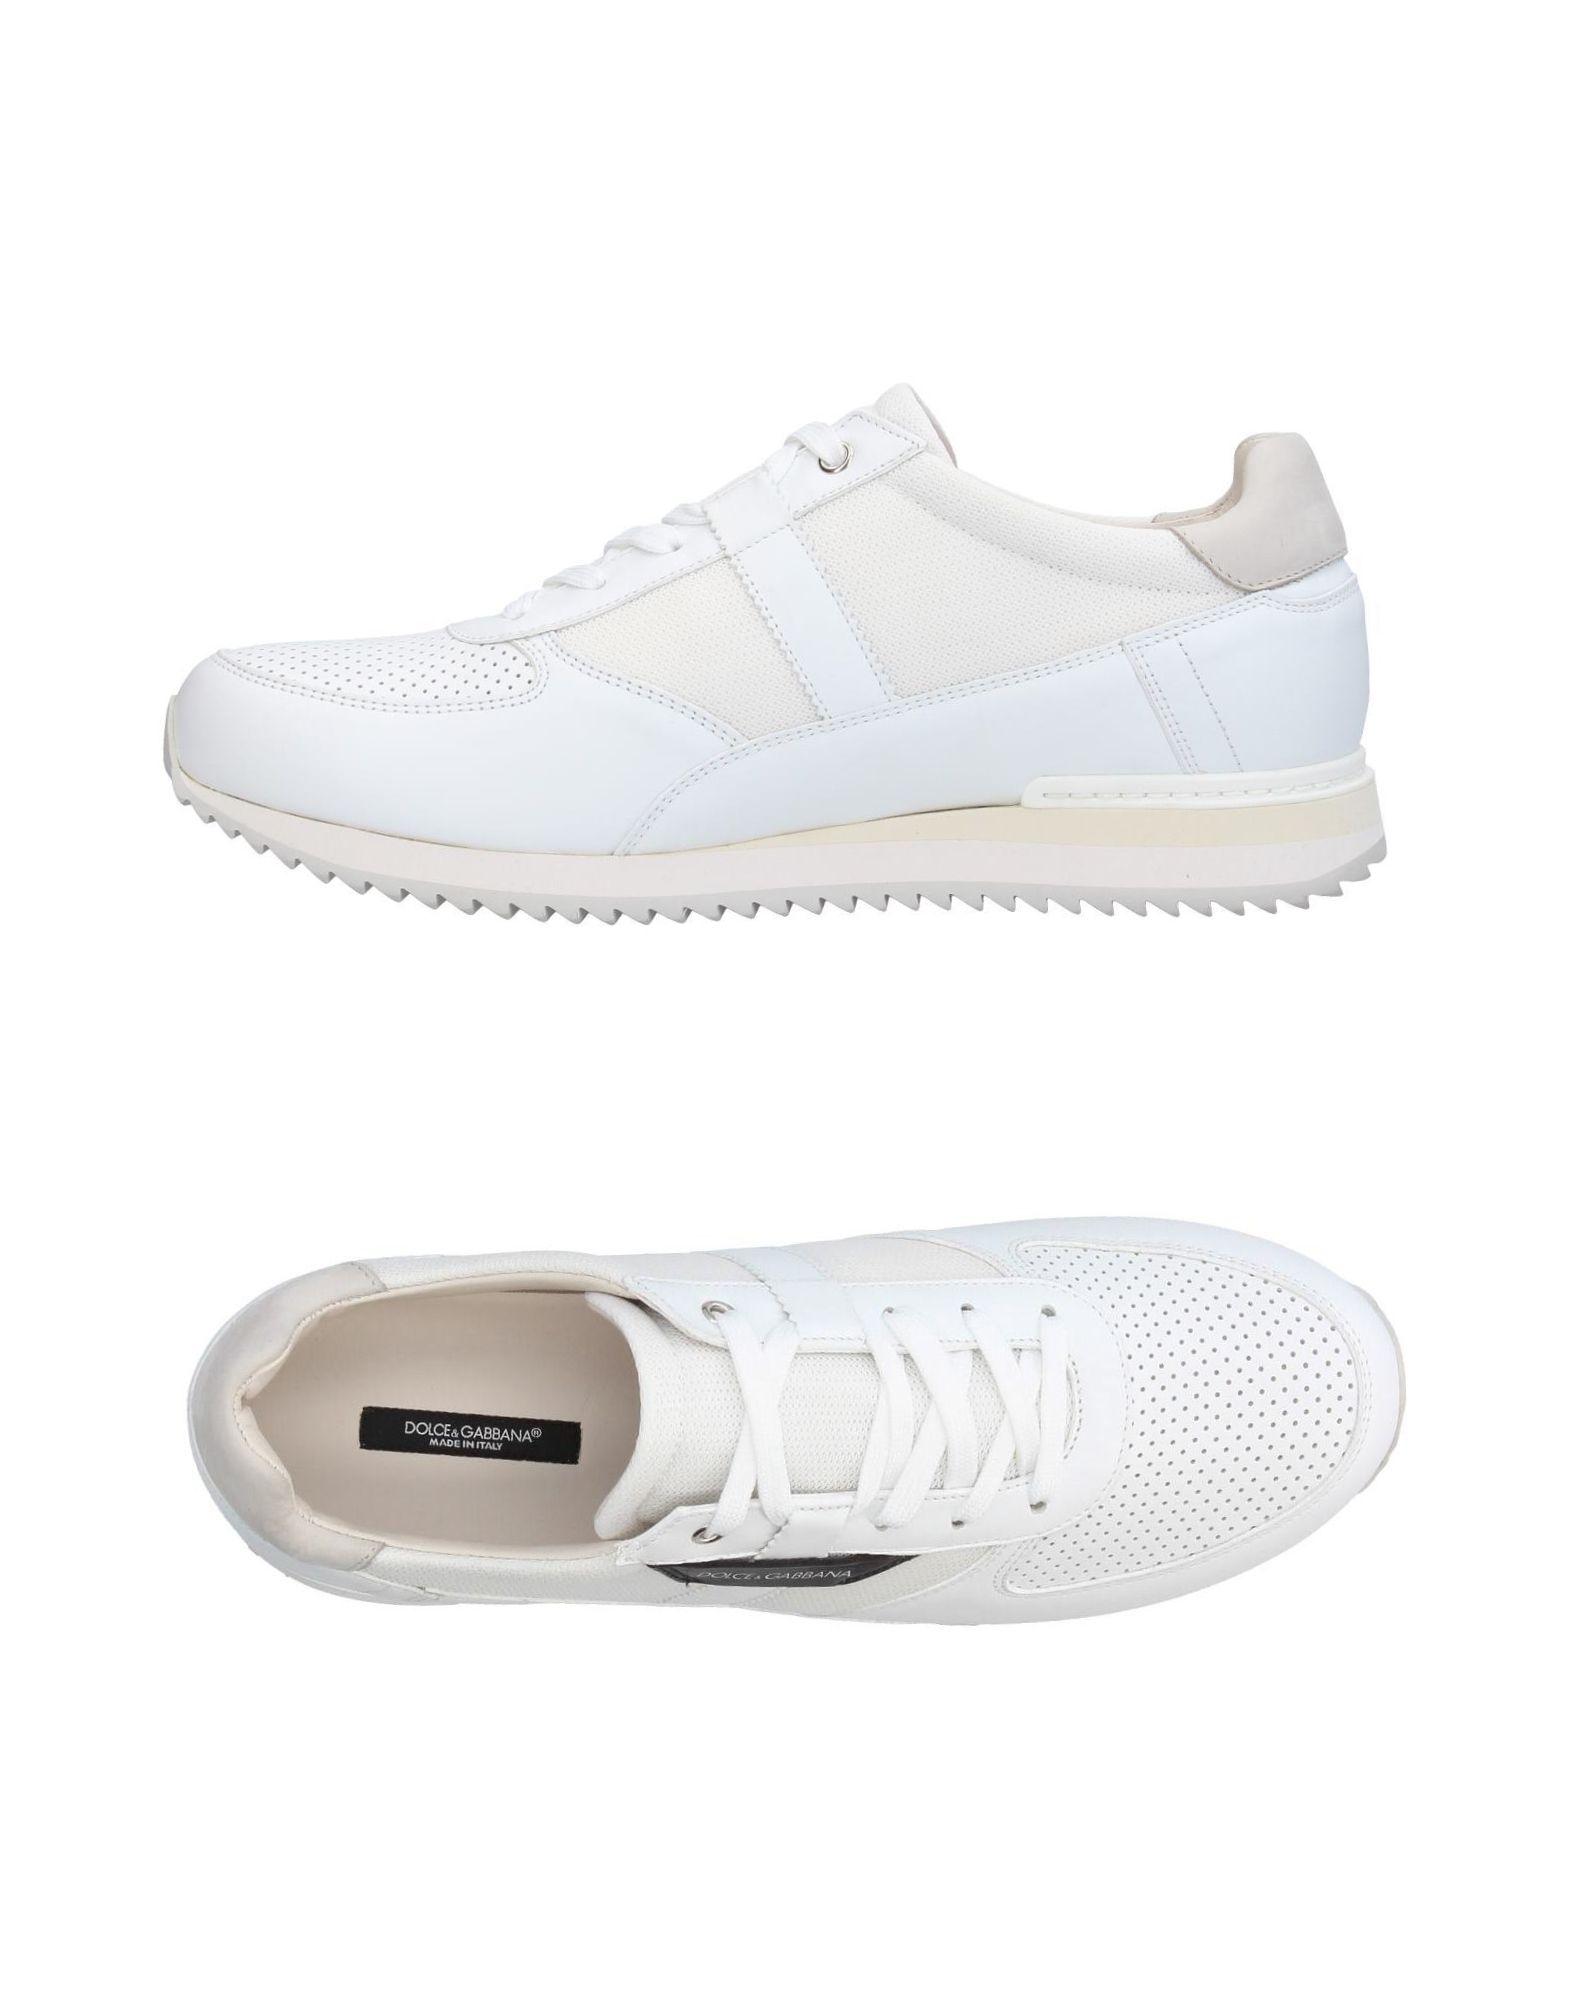 Dolce & Gabbana Sneakers Herren  11182577XI Gute Qualität beliebte Schuhe